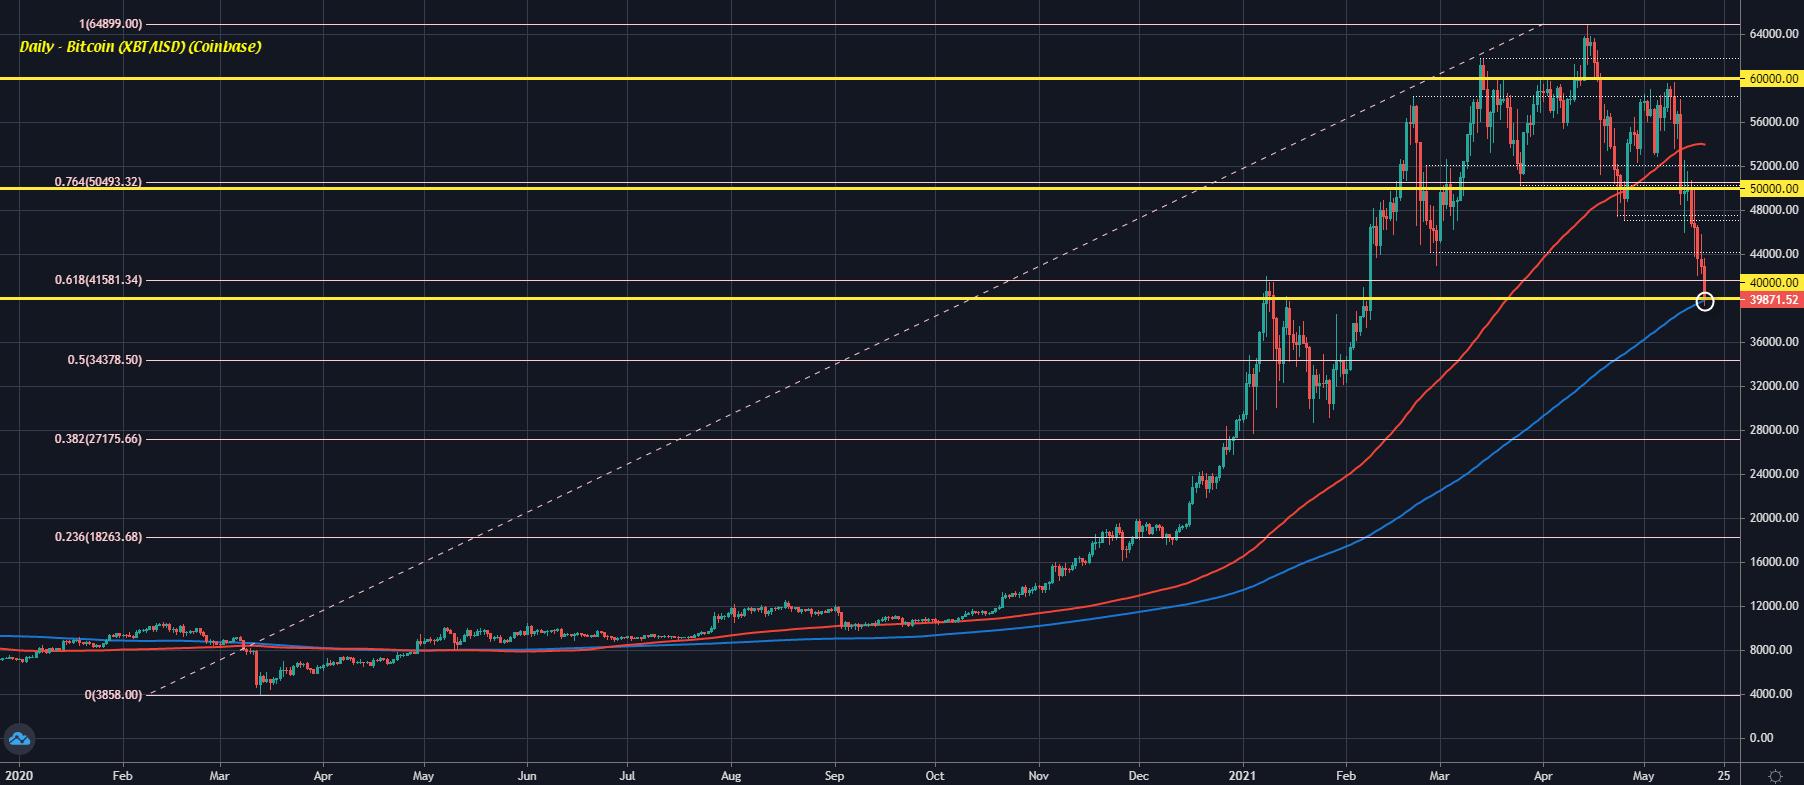 Bitcoin D1 19-05